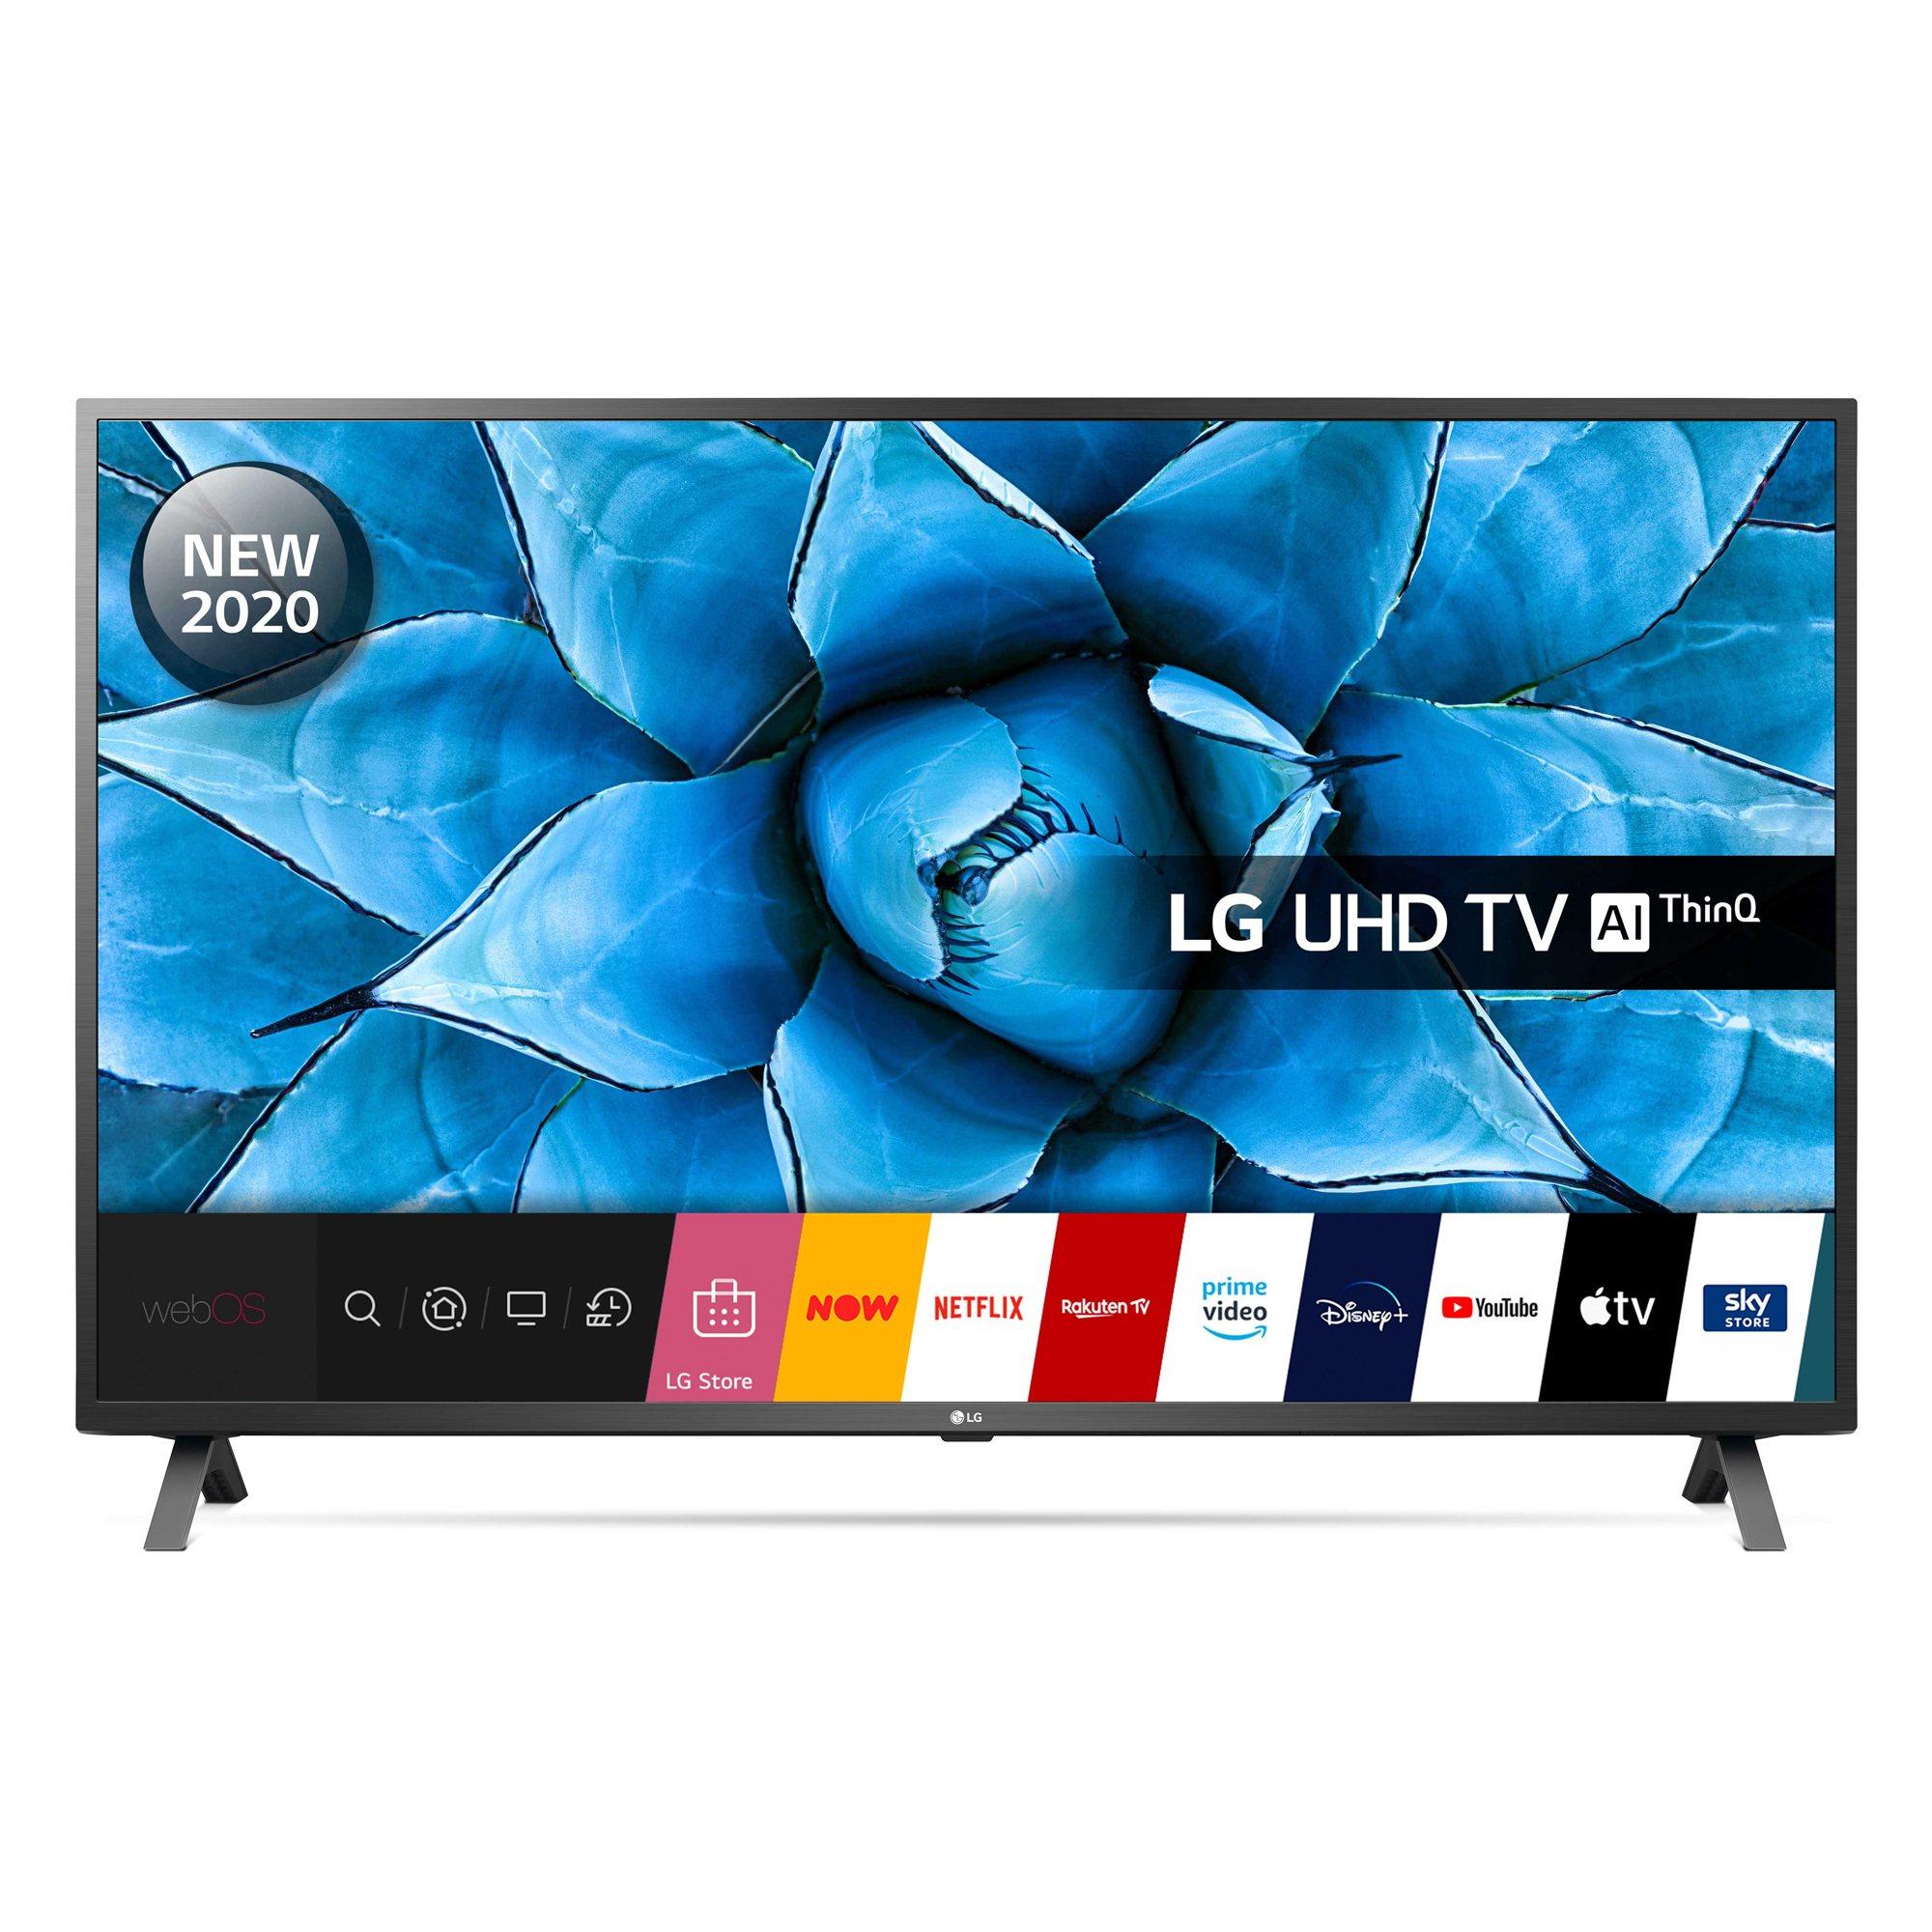 LG 55UN73006LA 55 4K Ultra HD Smart TV with webOS £379.95 using code @ eBay / Hughes Electrical